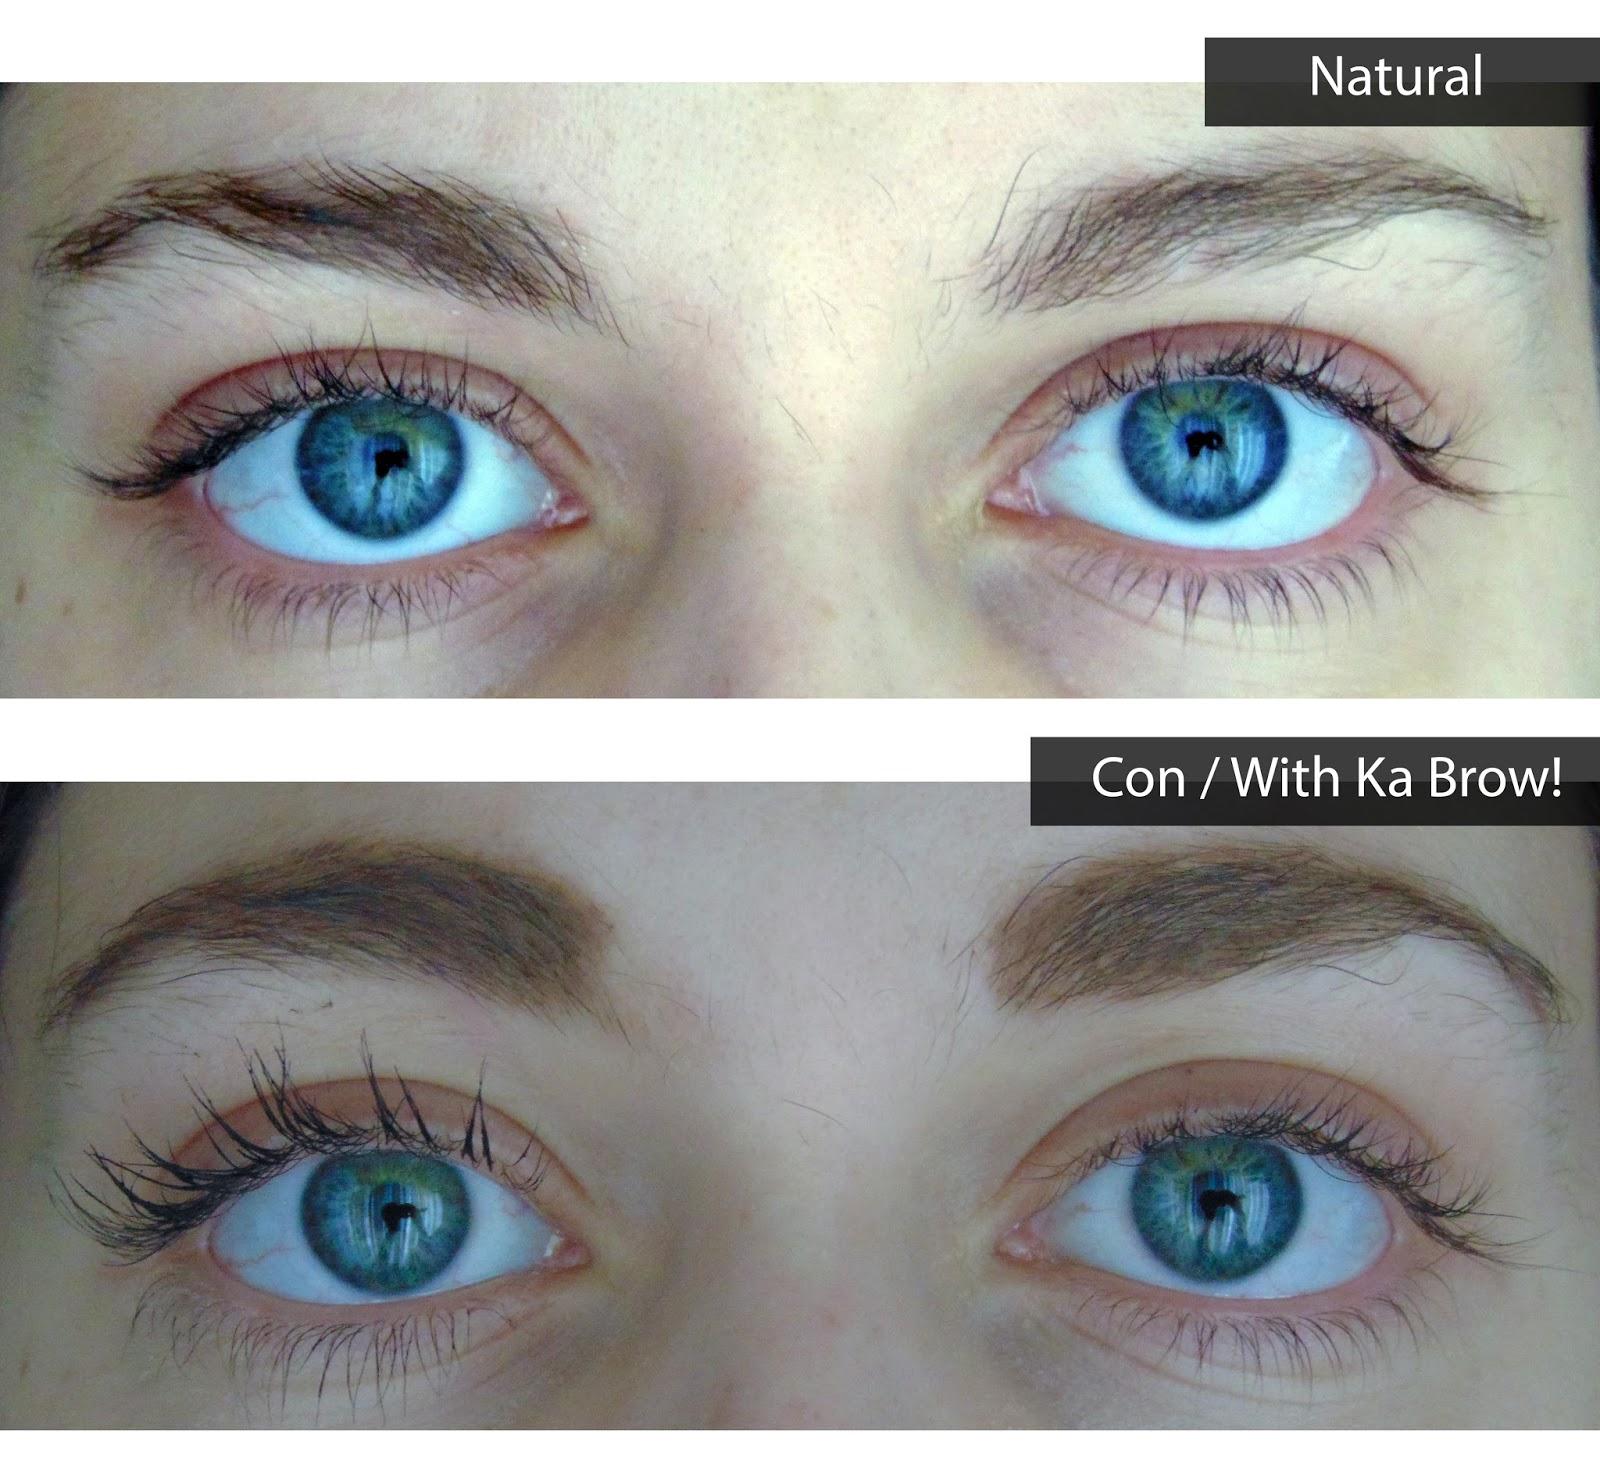 Review ka brow! brow gel before and after reseña gel cejas antes y después